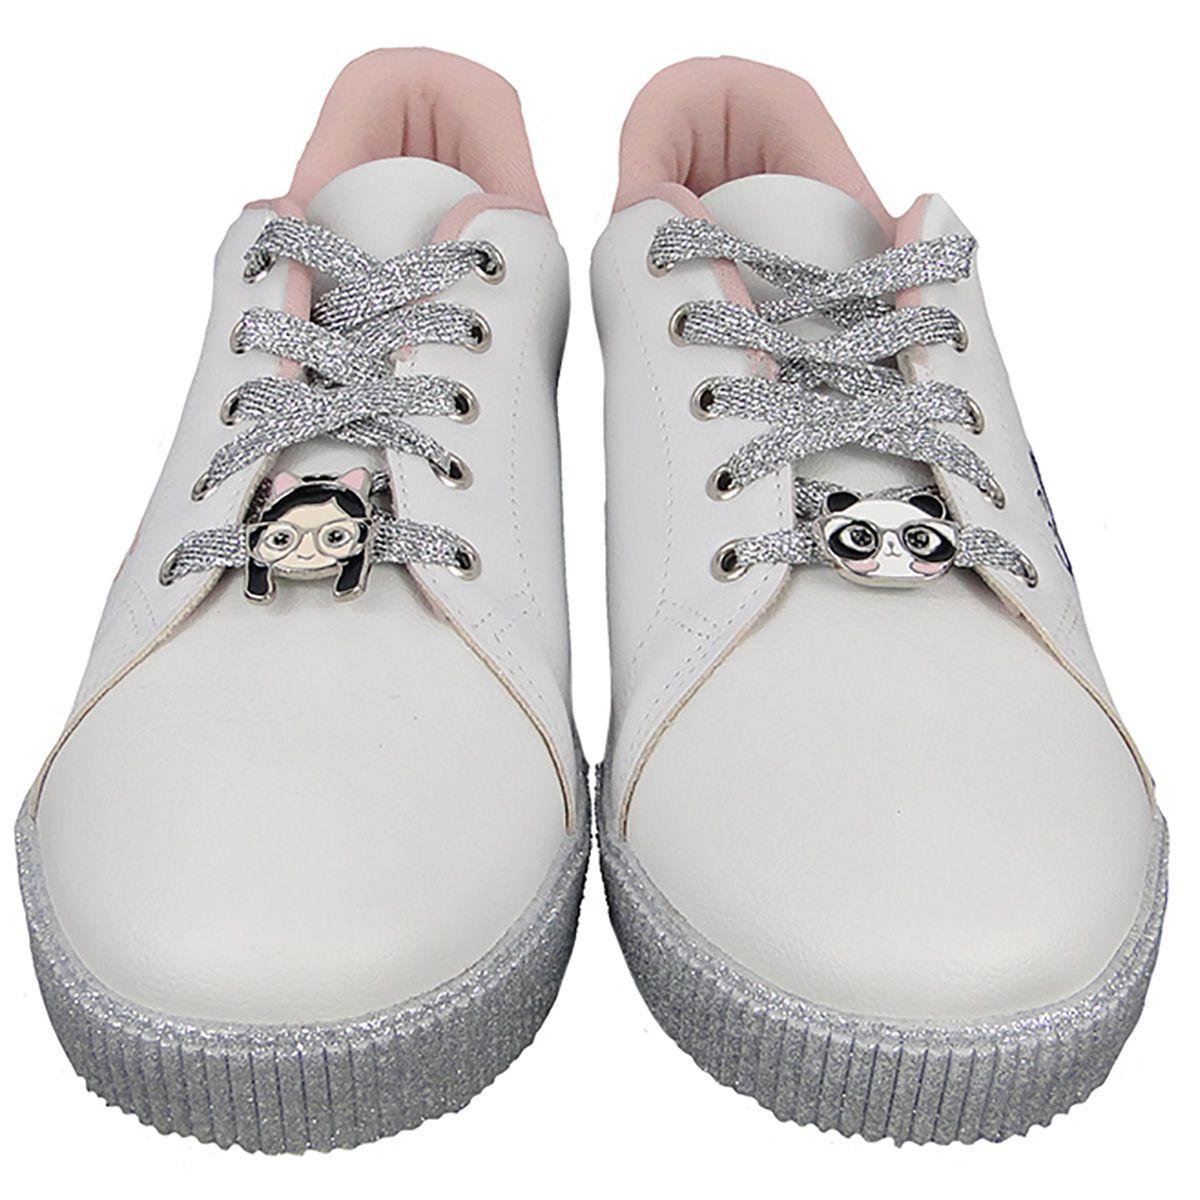 Tenis Infantil Luluca Pampili Blog Branco Glitter e Patches